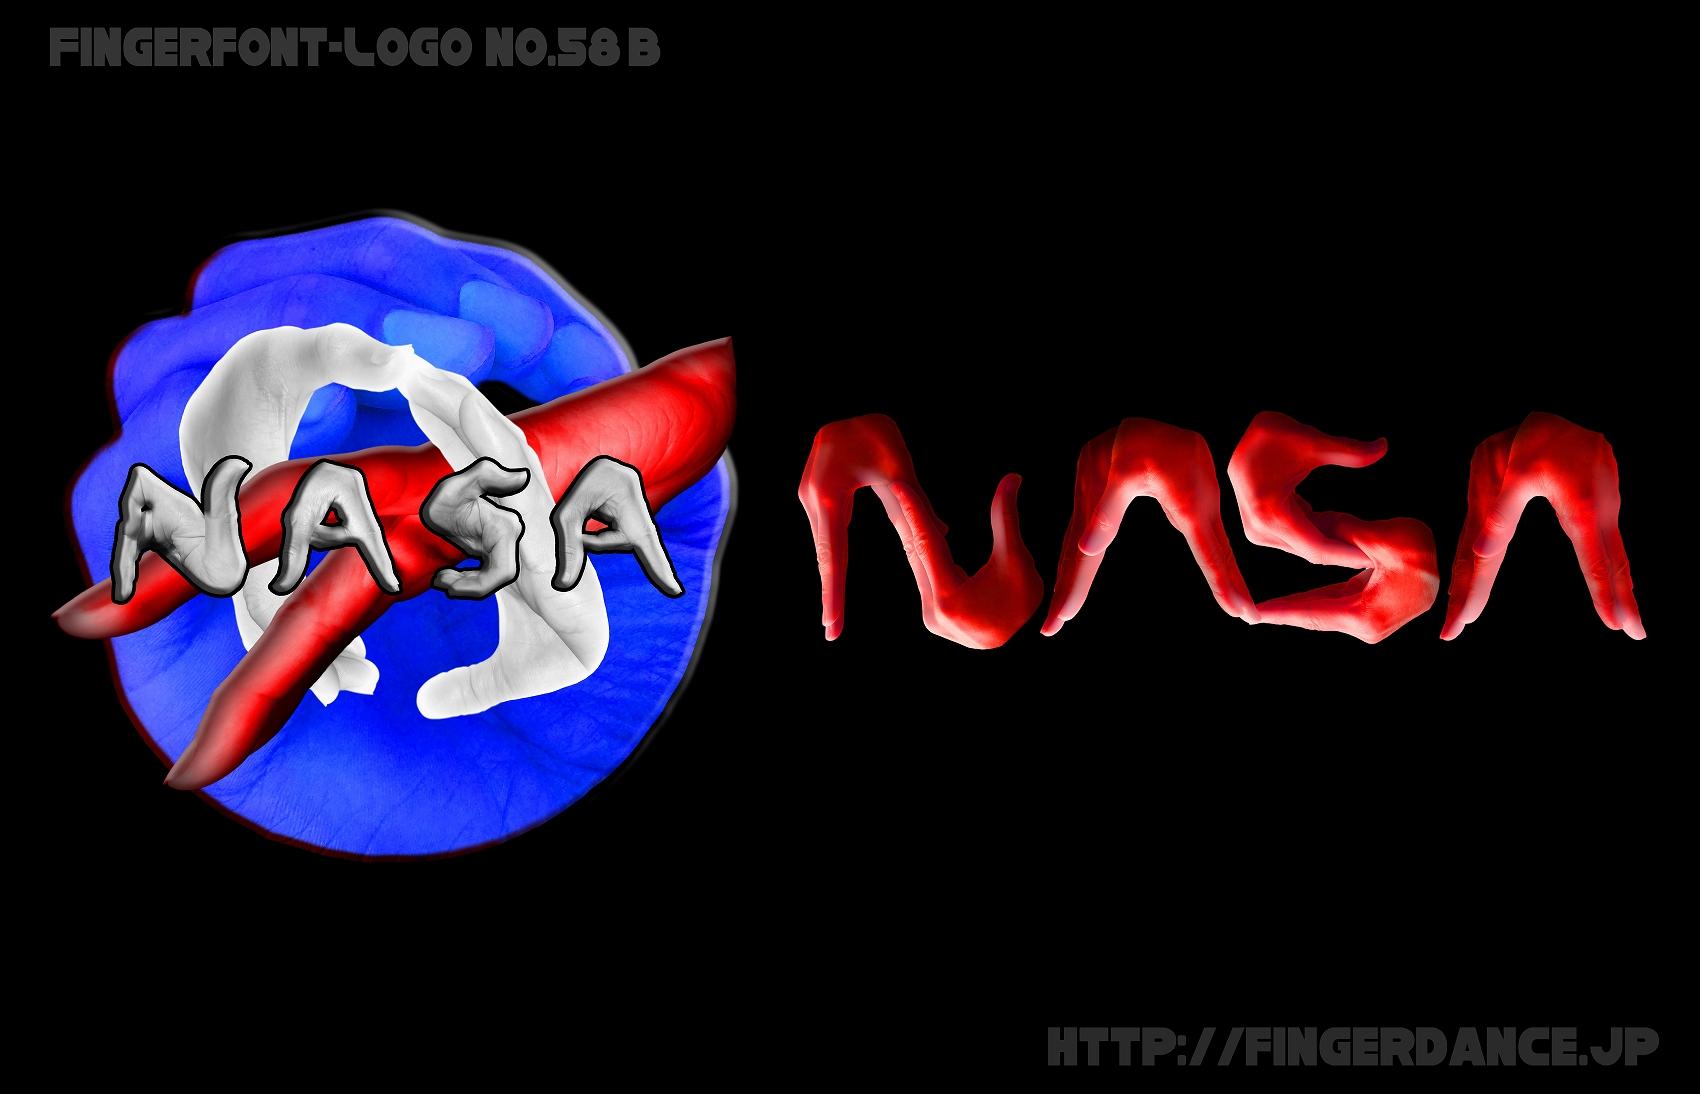 NASA-fingerlogohand ナサフィンガーロゴハンド手指